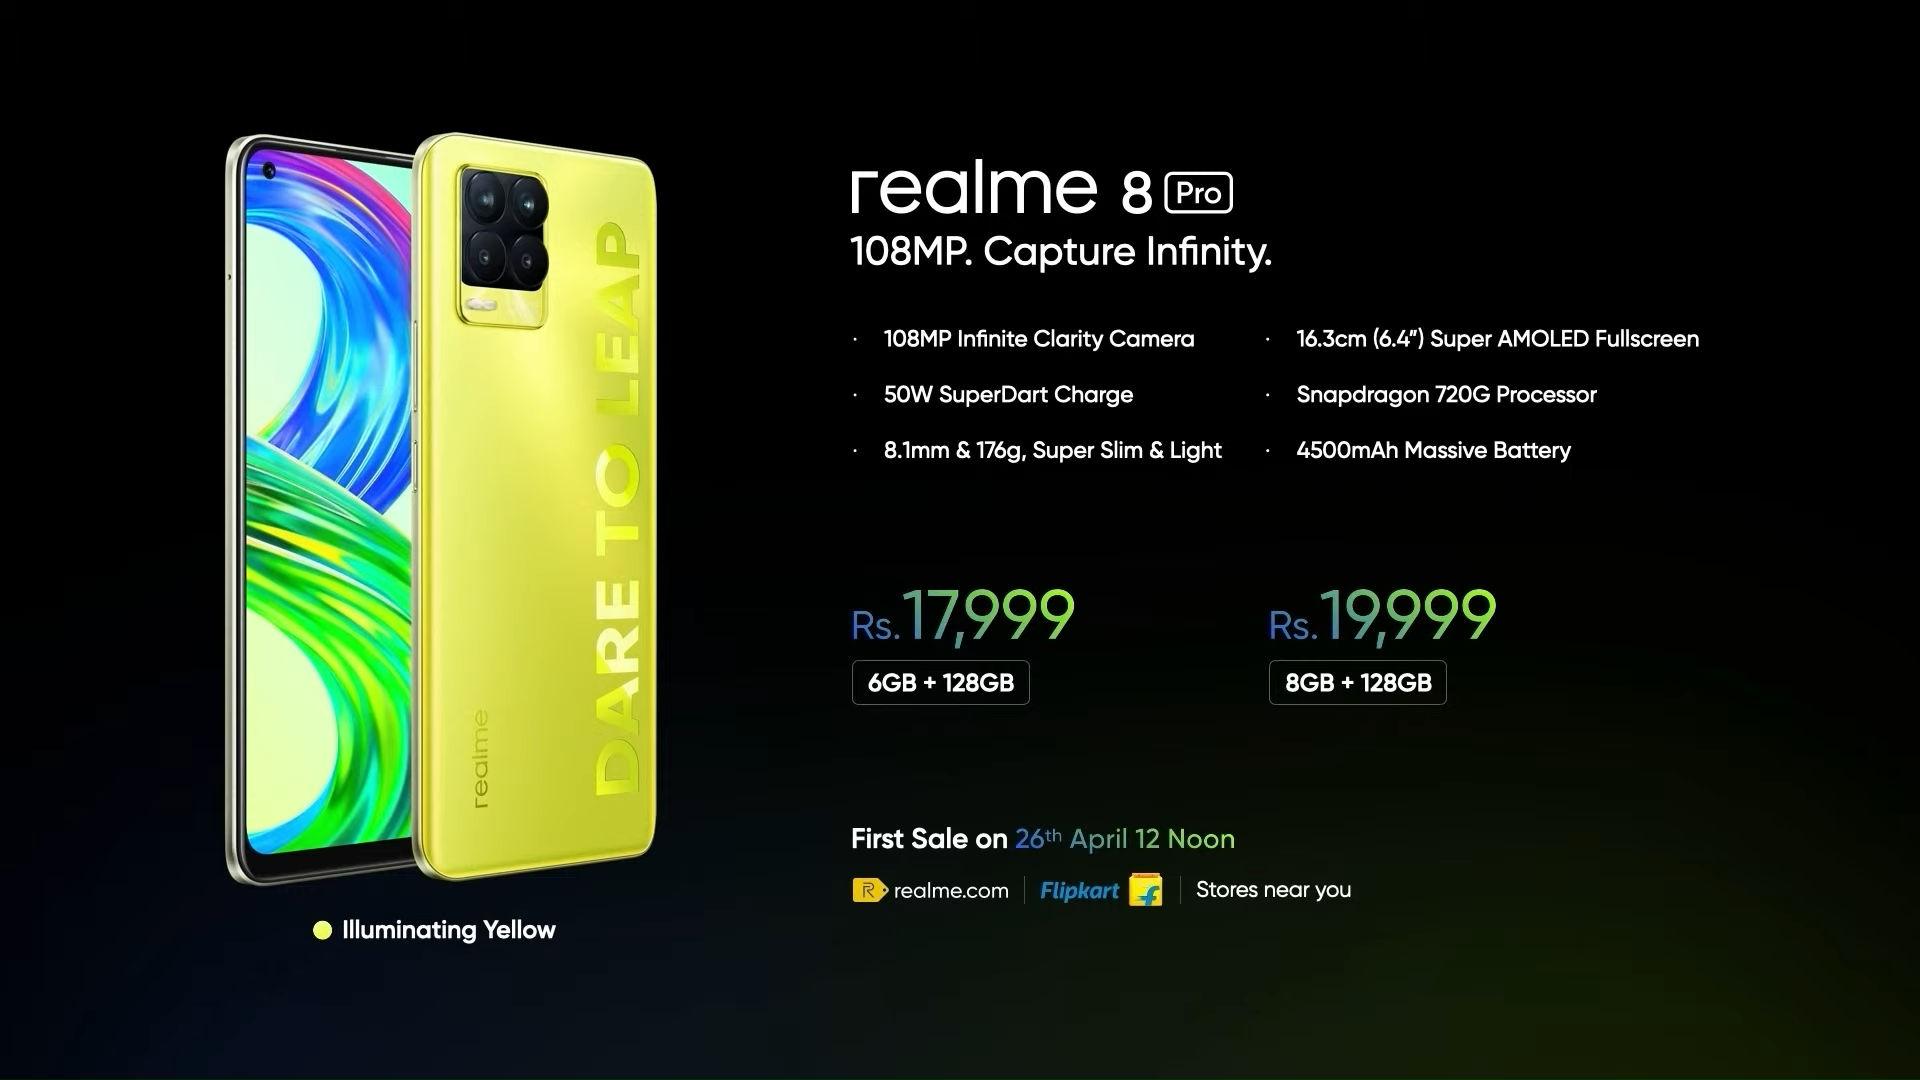 Realme_8_Pro_Illuminating_Yellow_color_price_India_avucation_details